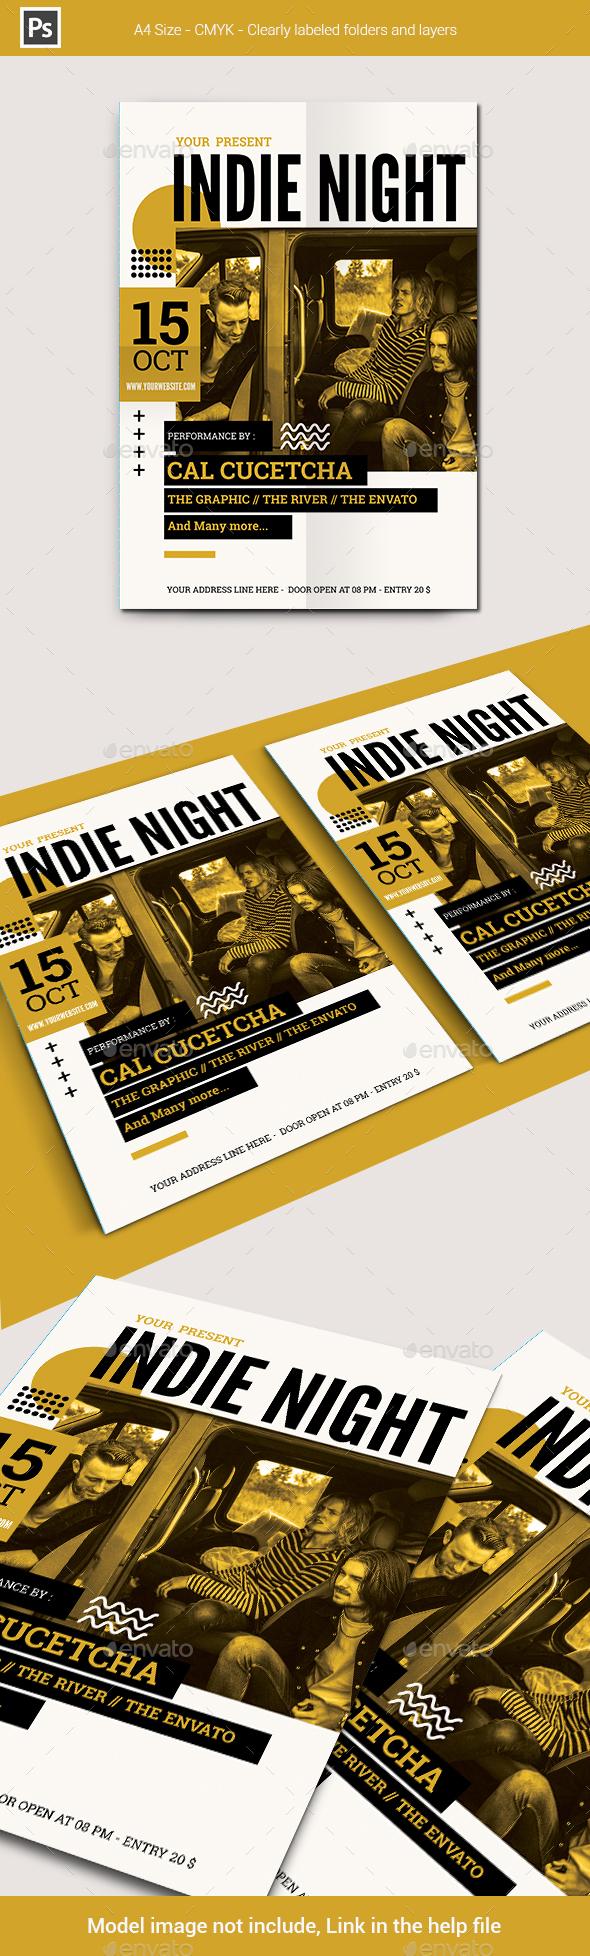 Indie Night Flyer Template